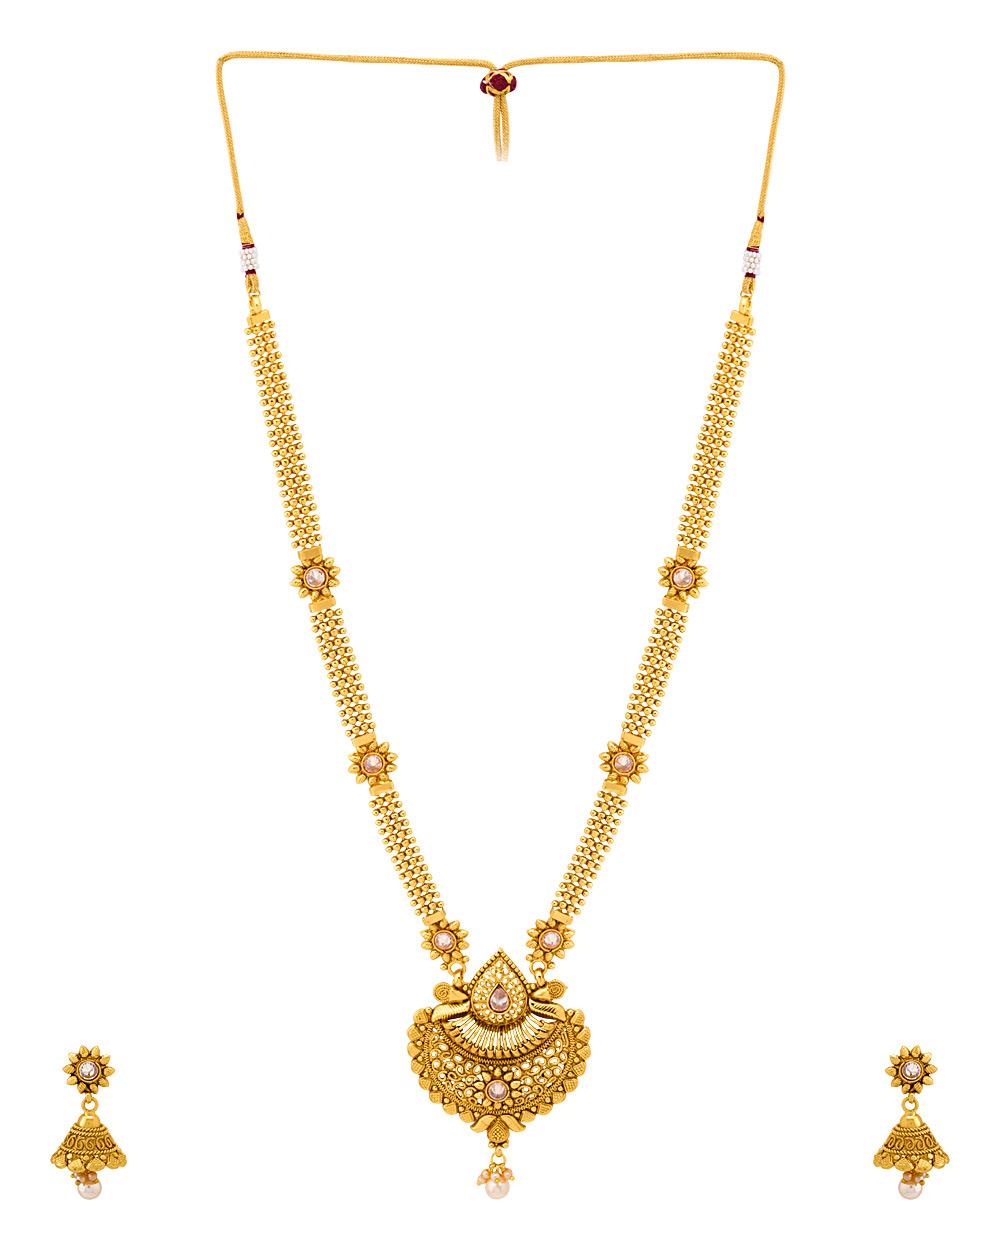 Buy Ethnic Sanskriti Rani Haar Necklace Set Online India | Voylla